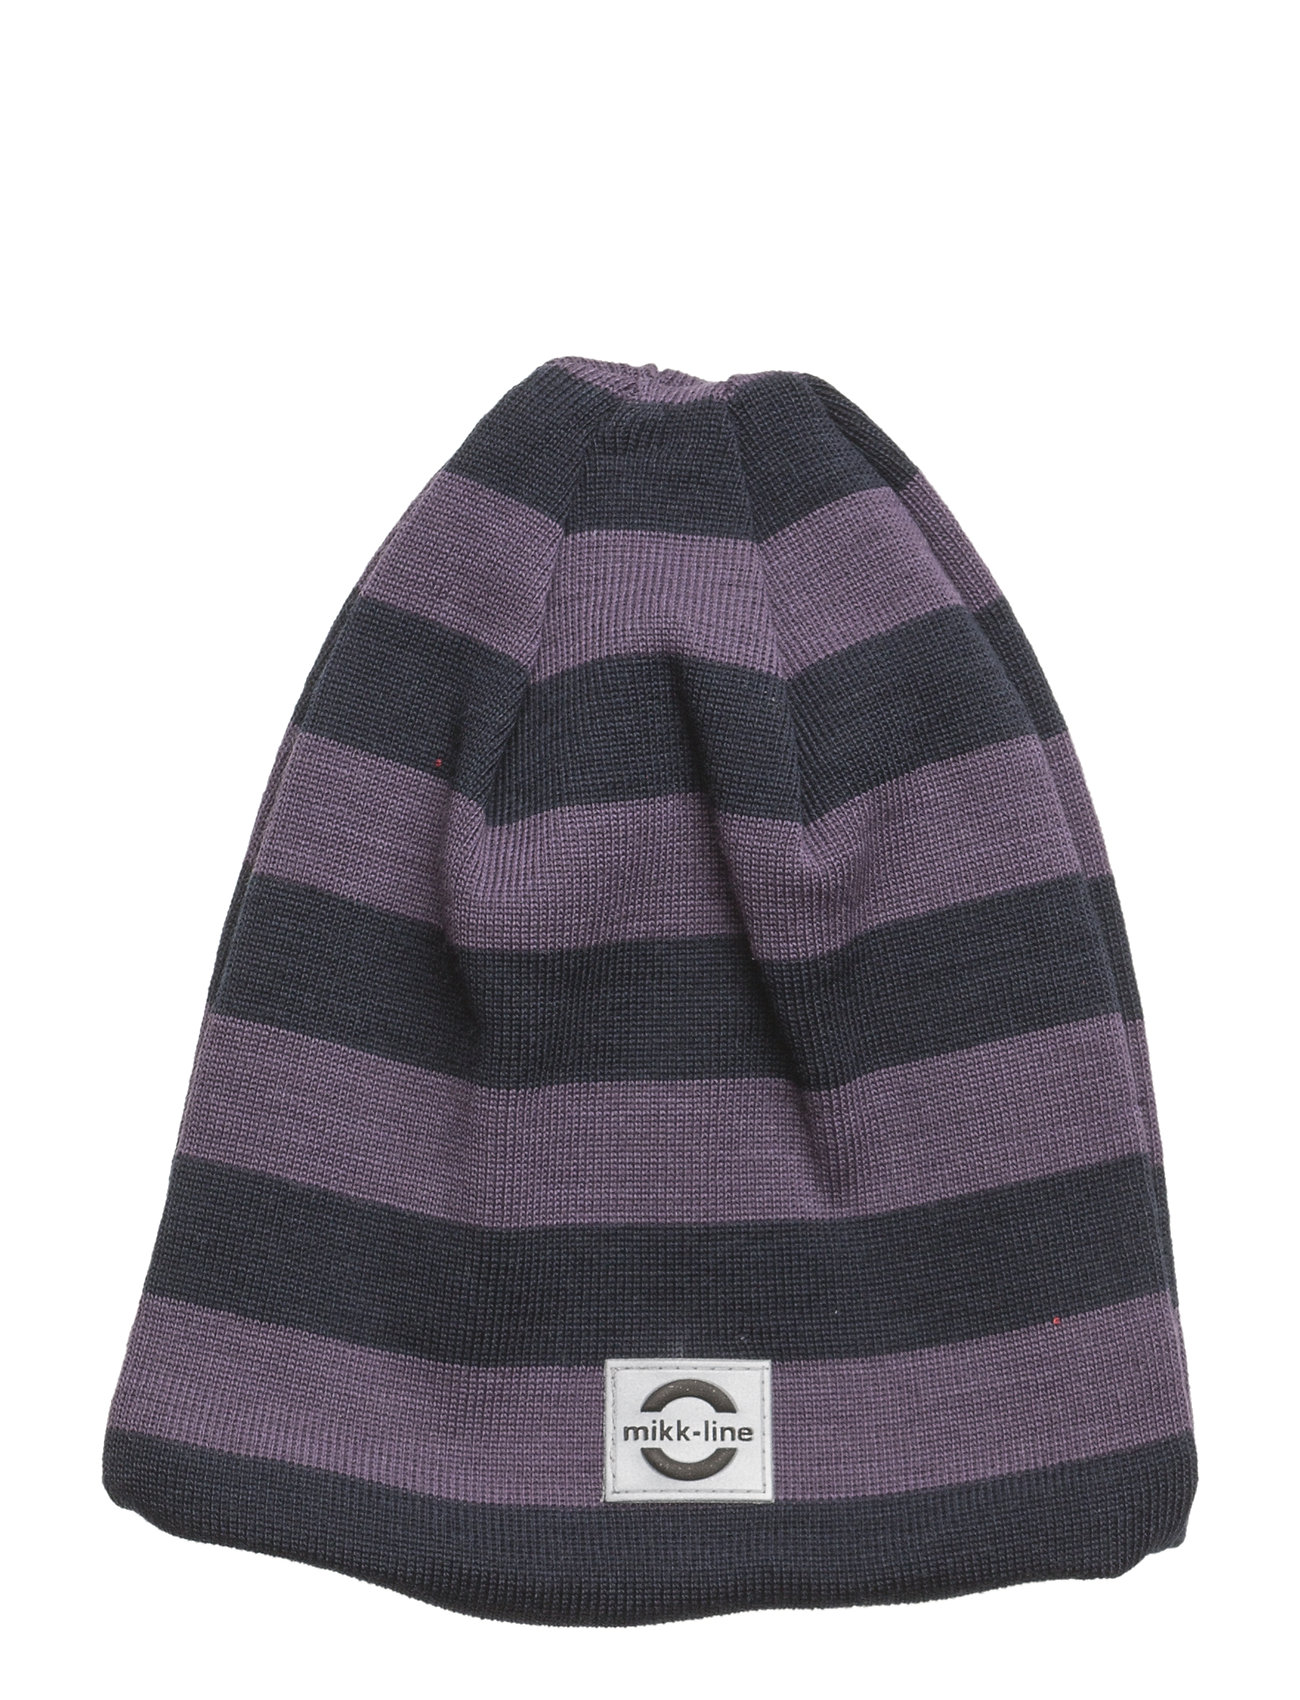 Image of Wool Hat Hat Lilla MIKK-LINE (3060303583)